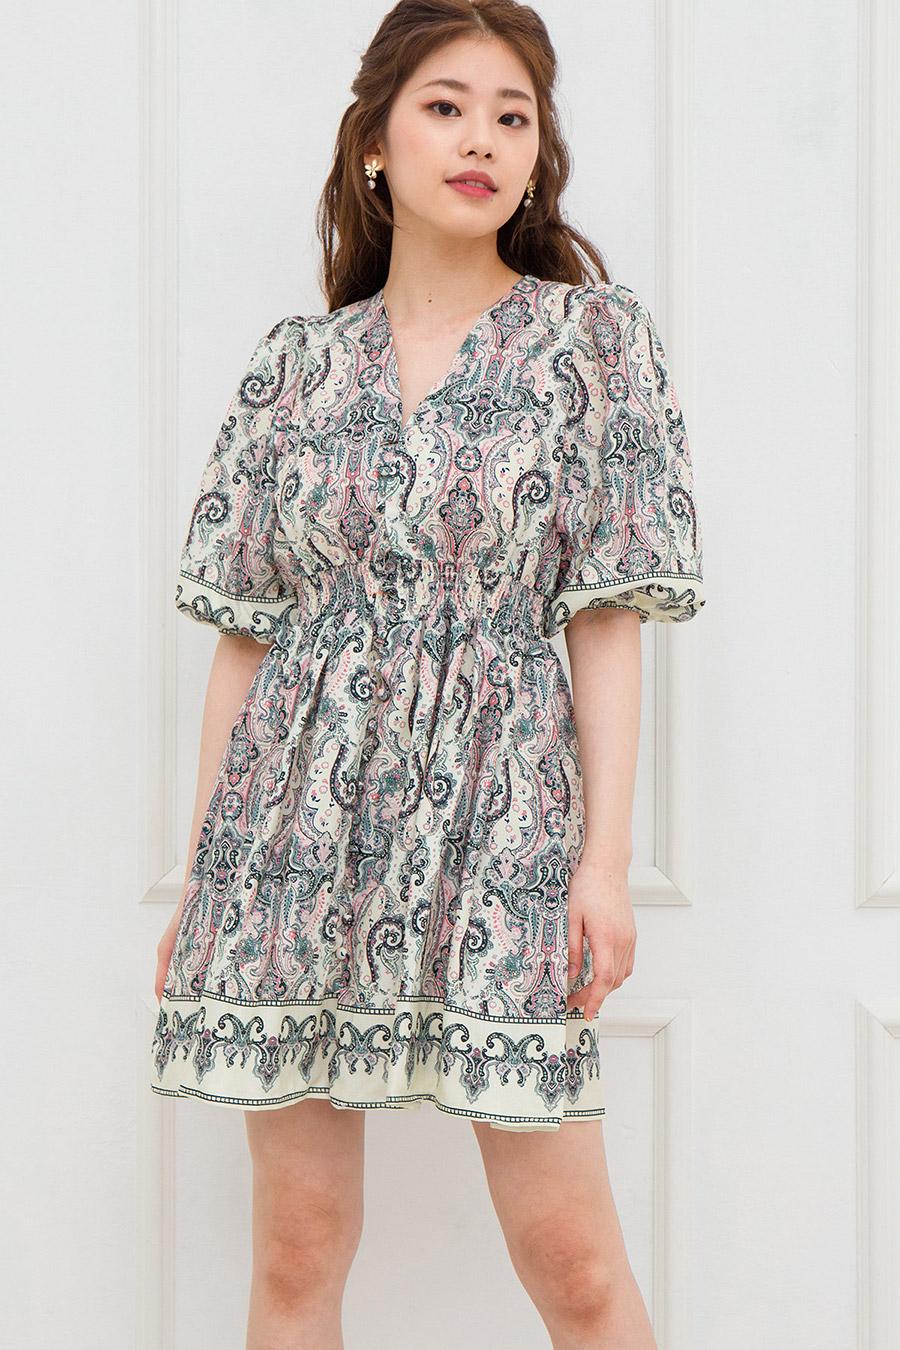 VELLUTO DRESS - PINK PAISLEY